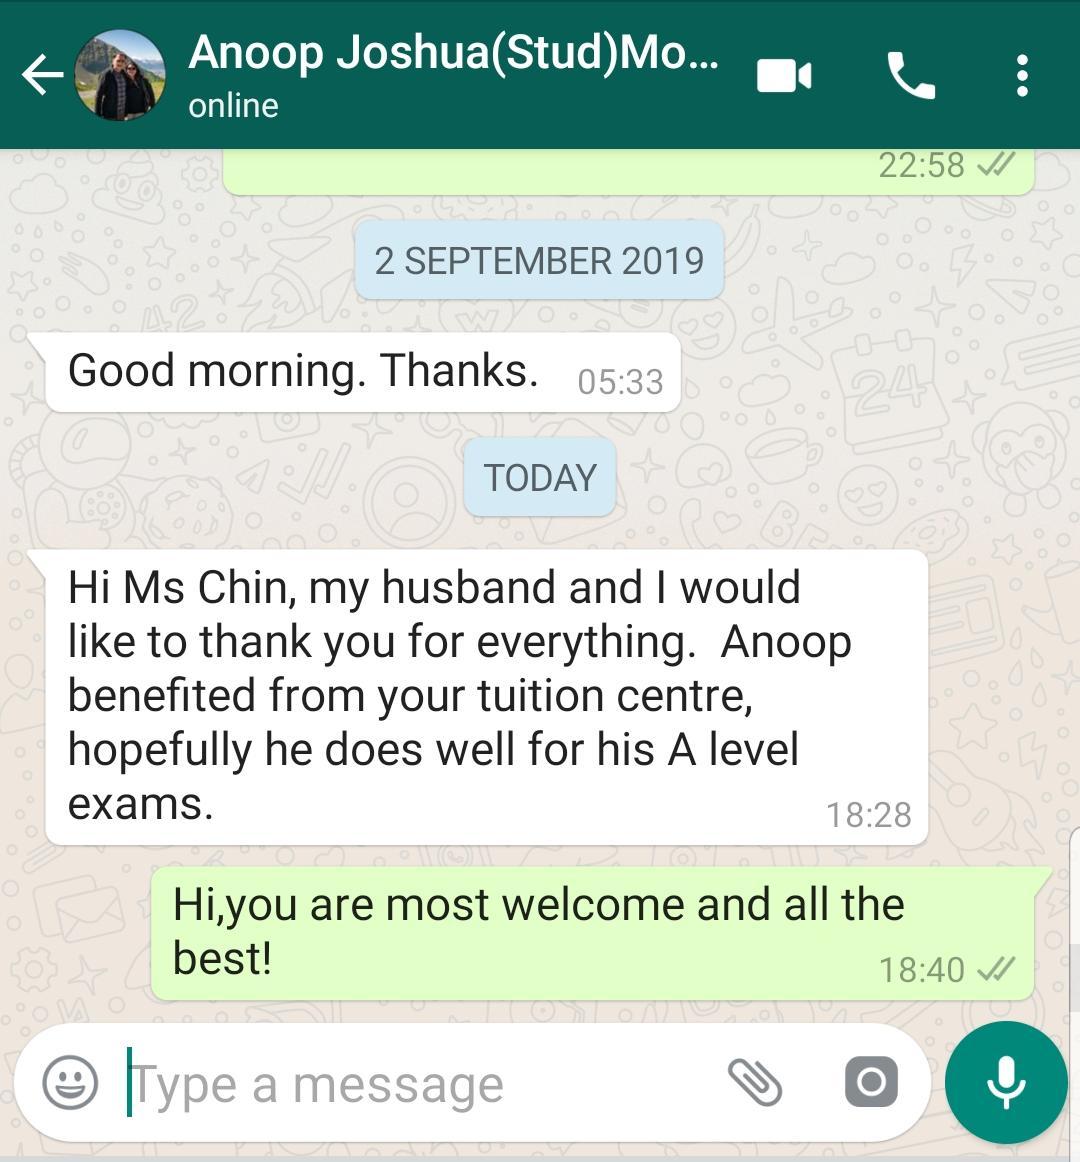 WhatsApp Image 2019-11-12 at 7.04.12 PM.